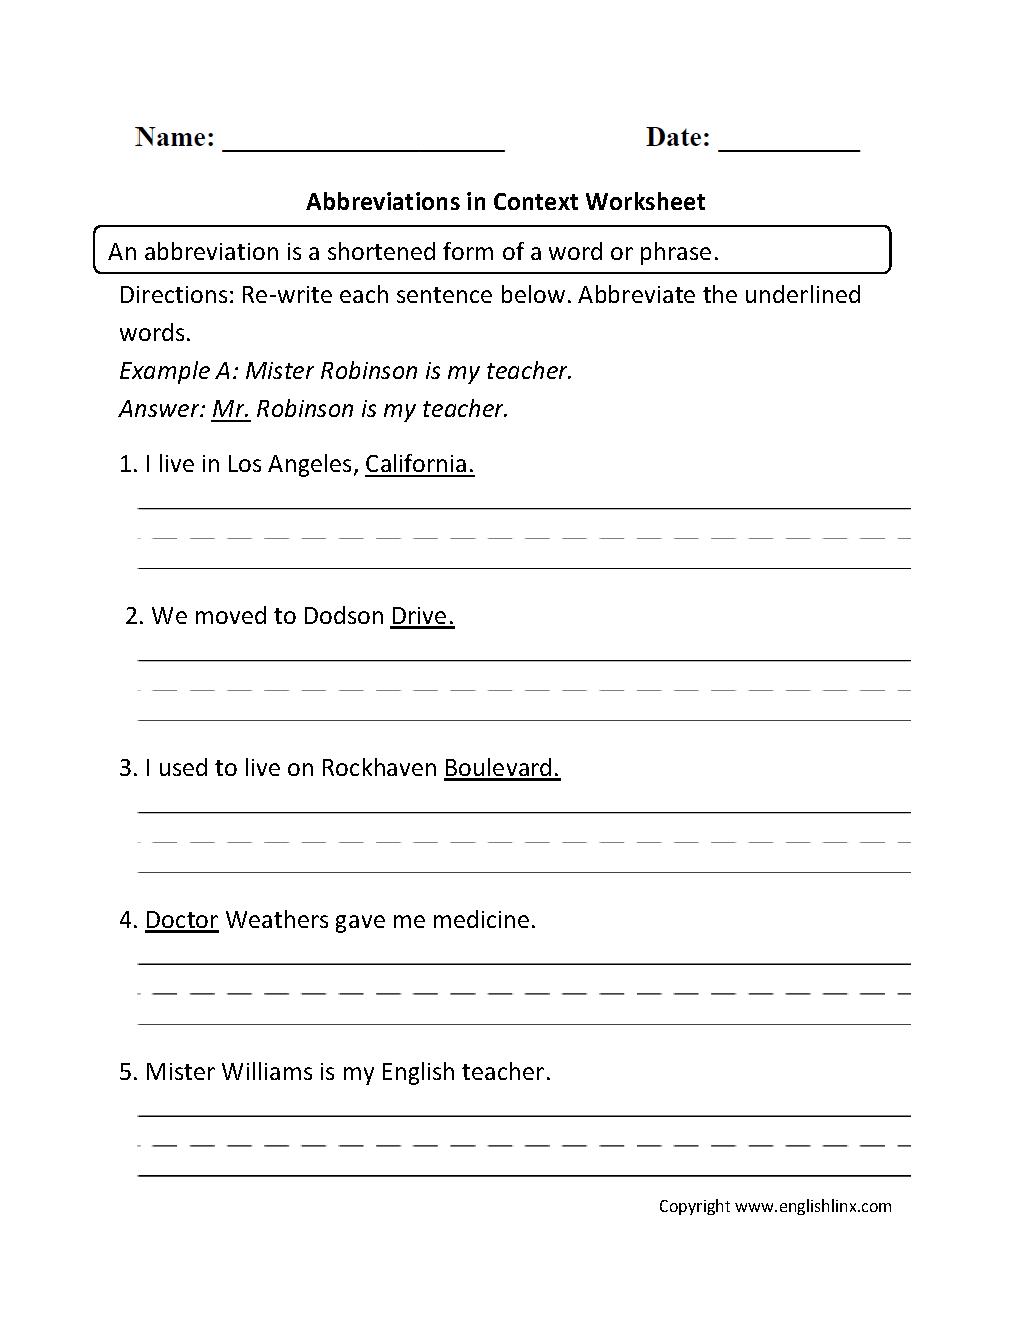 Abbreviations in Context Worksheet   2nd grade worksheets [ 1342 x 1012 Pixel ]